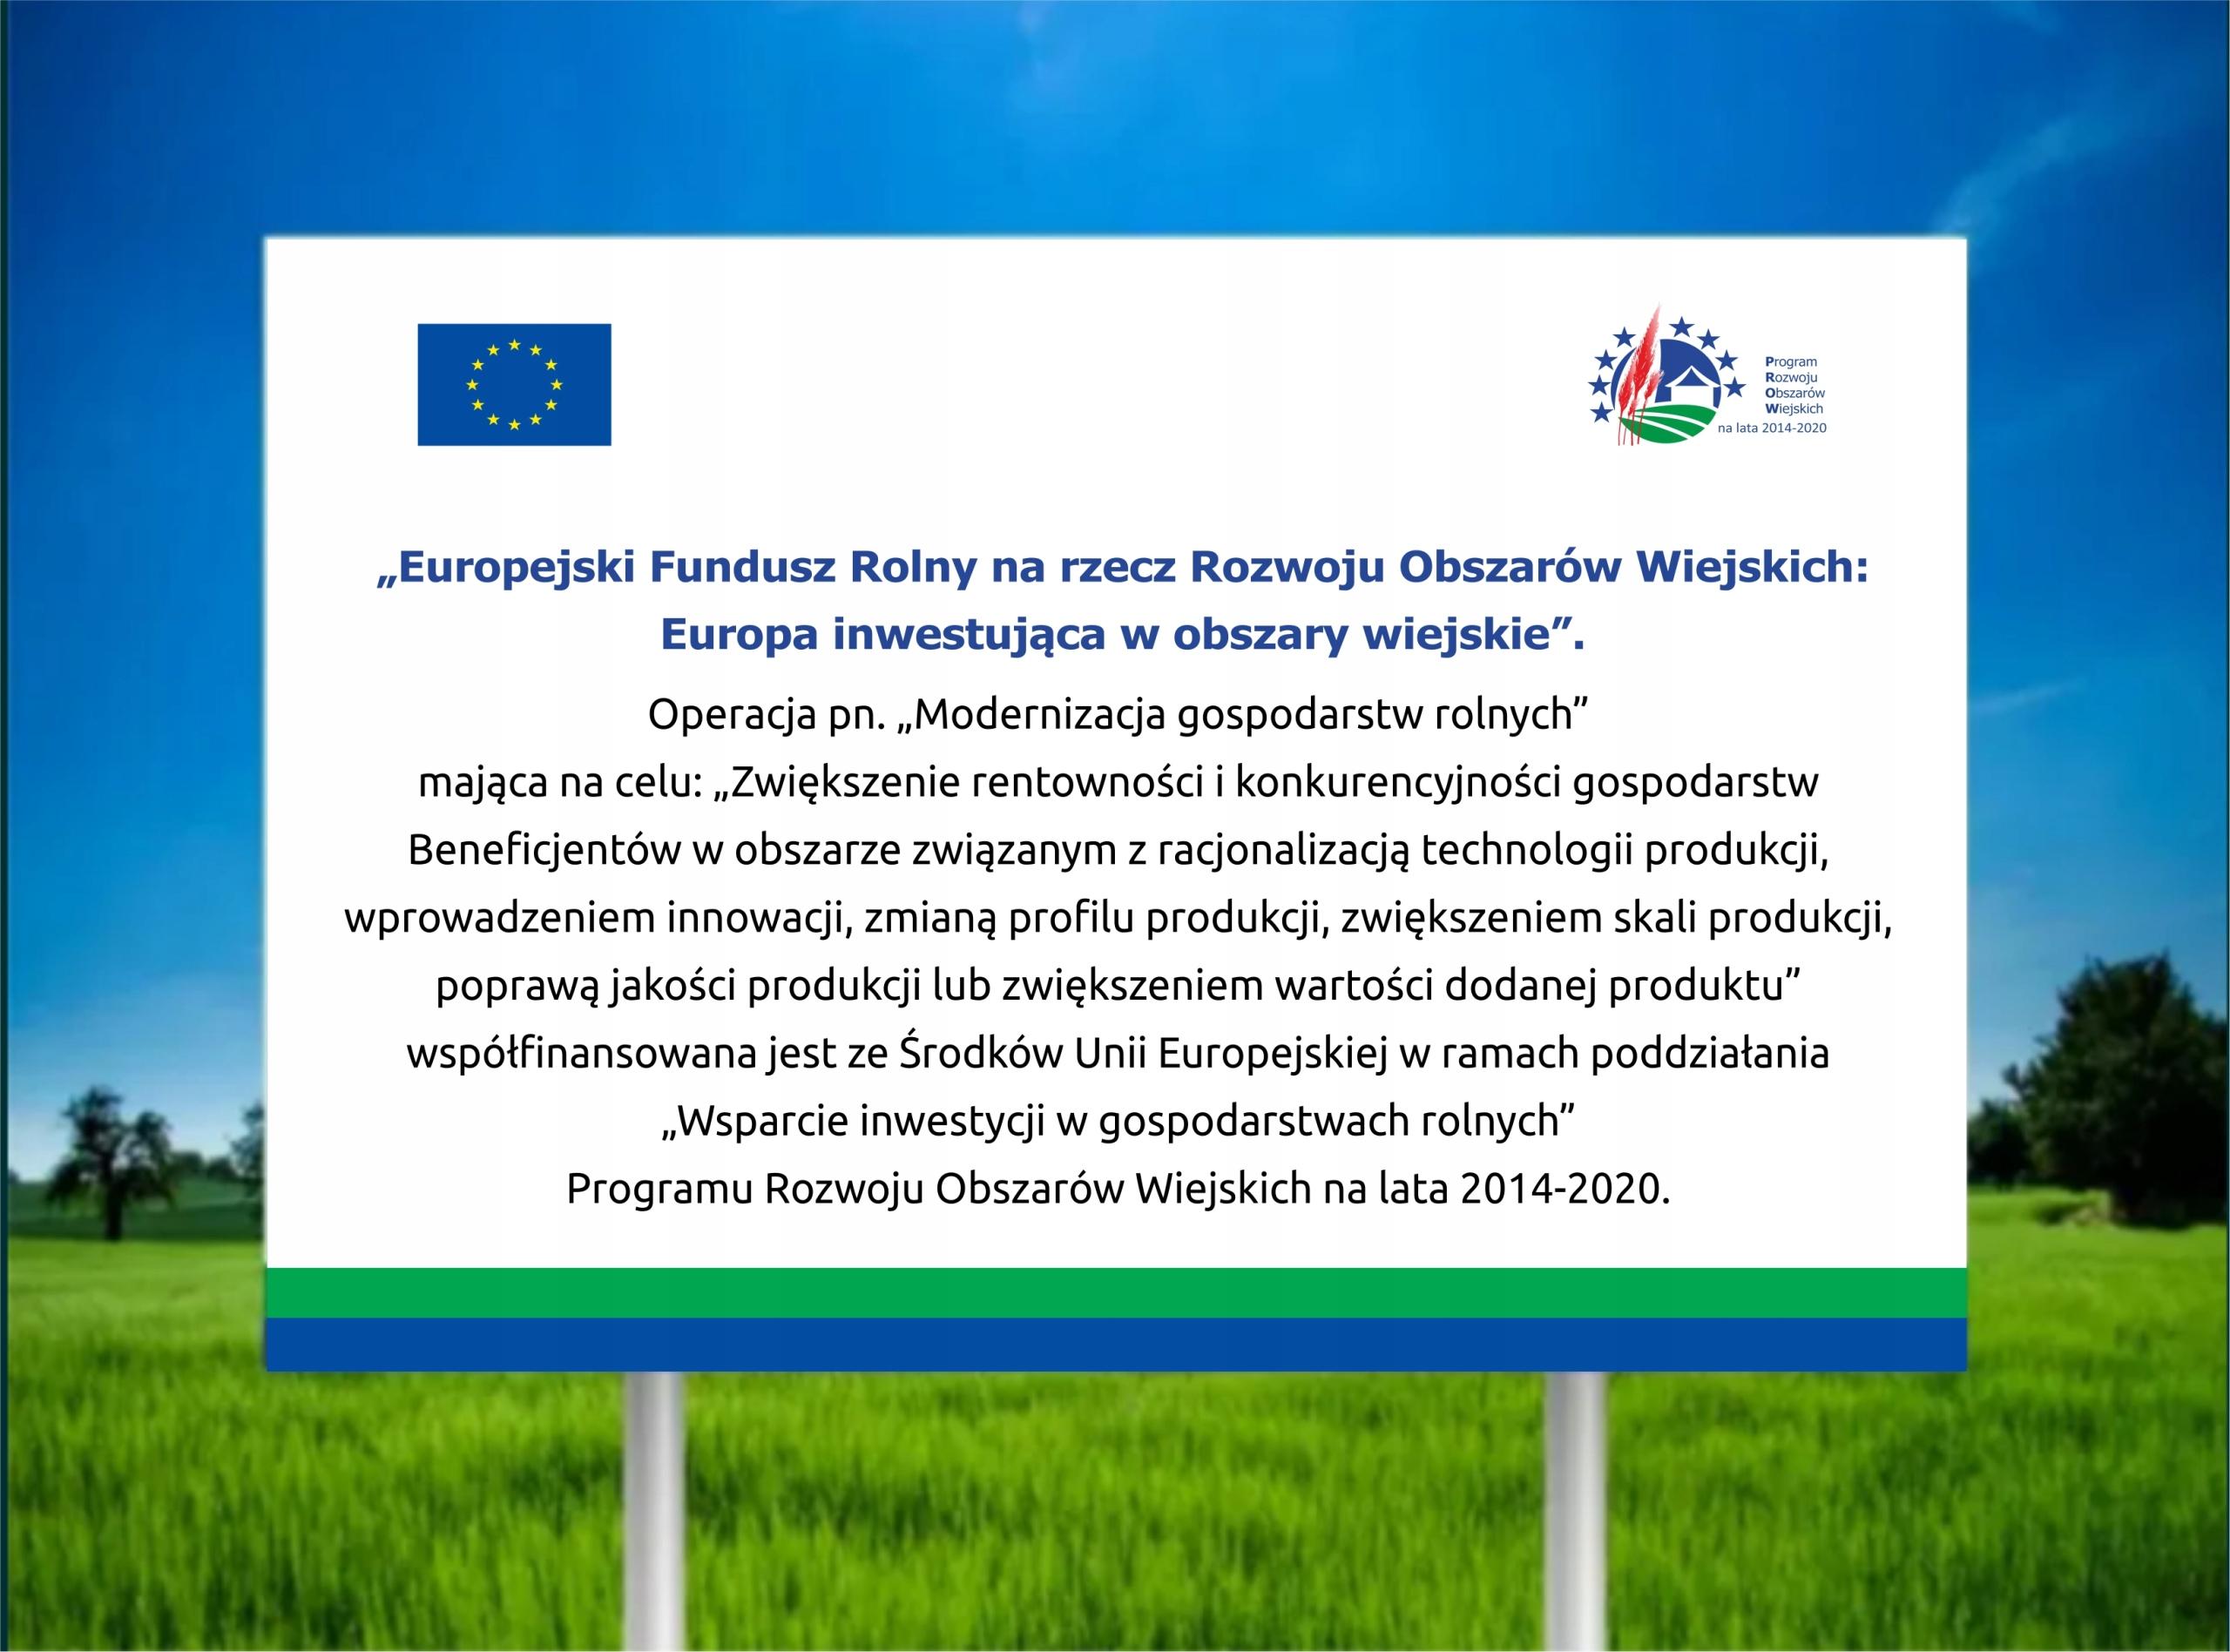 ЕС тарелка RDP 2014-2020, 120x80см ARiMR 5мм